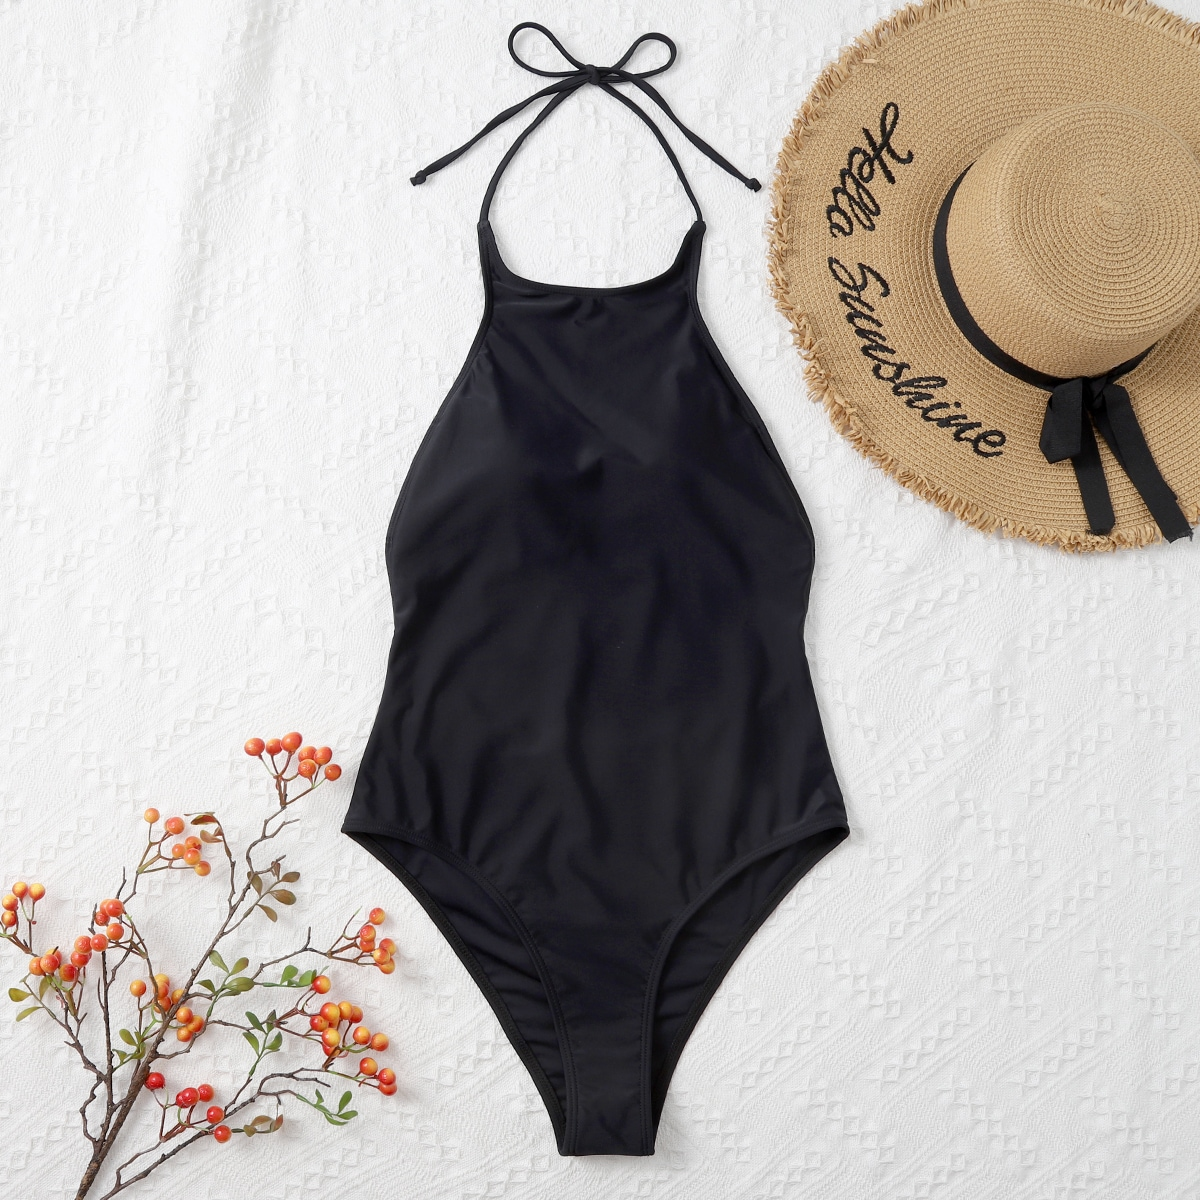 Plain Backless Halter One Piece Swimsuit